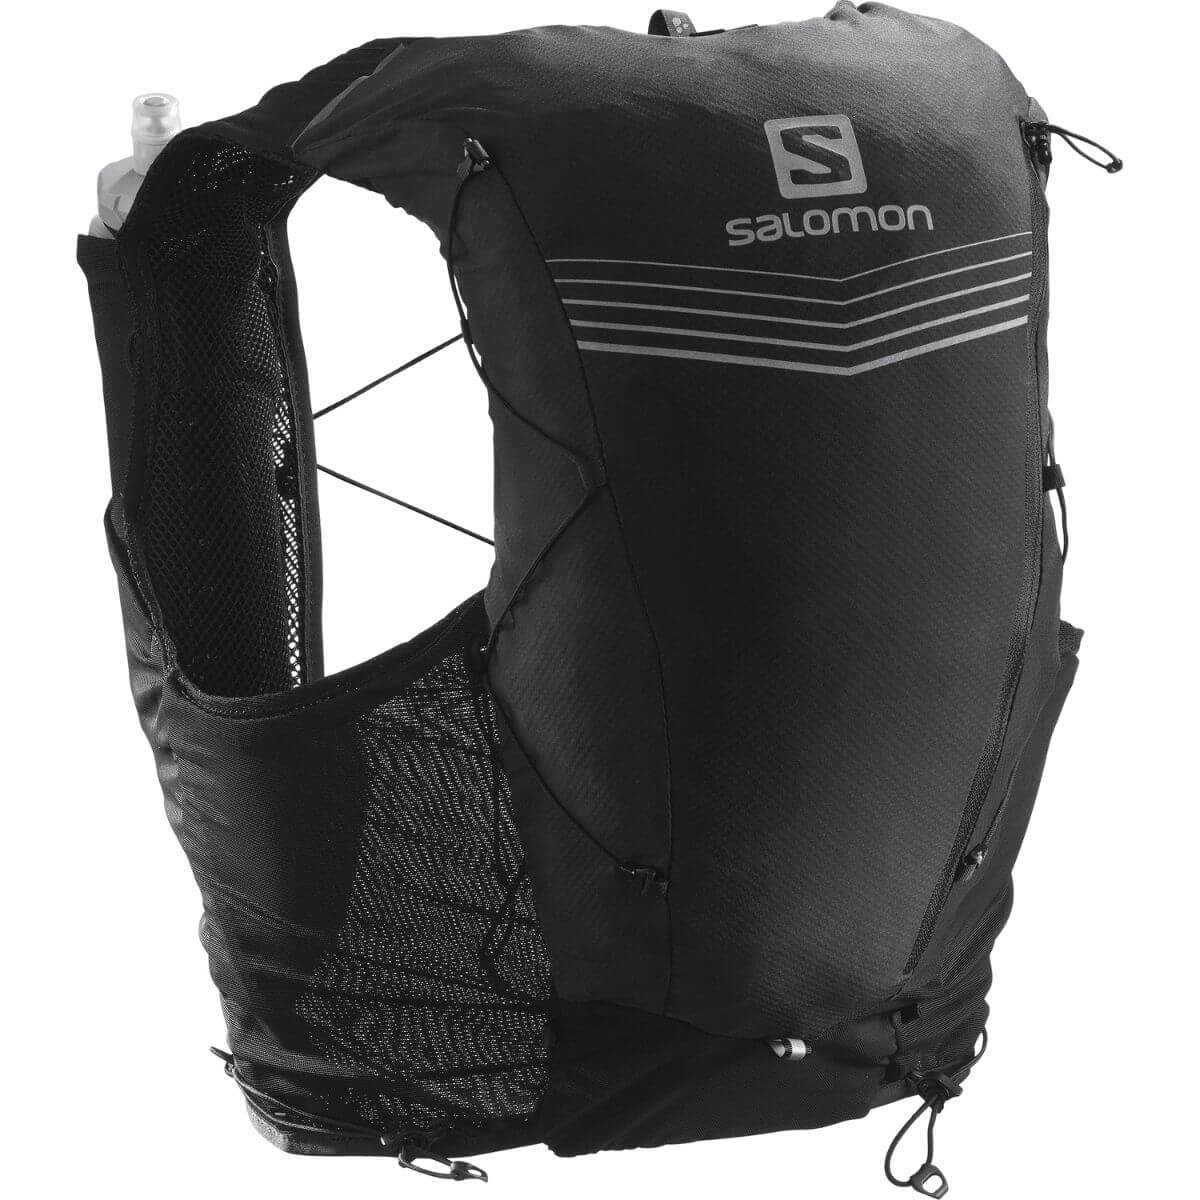 Black Salomon hydration pack.